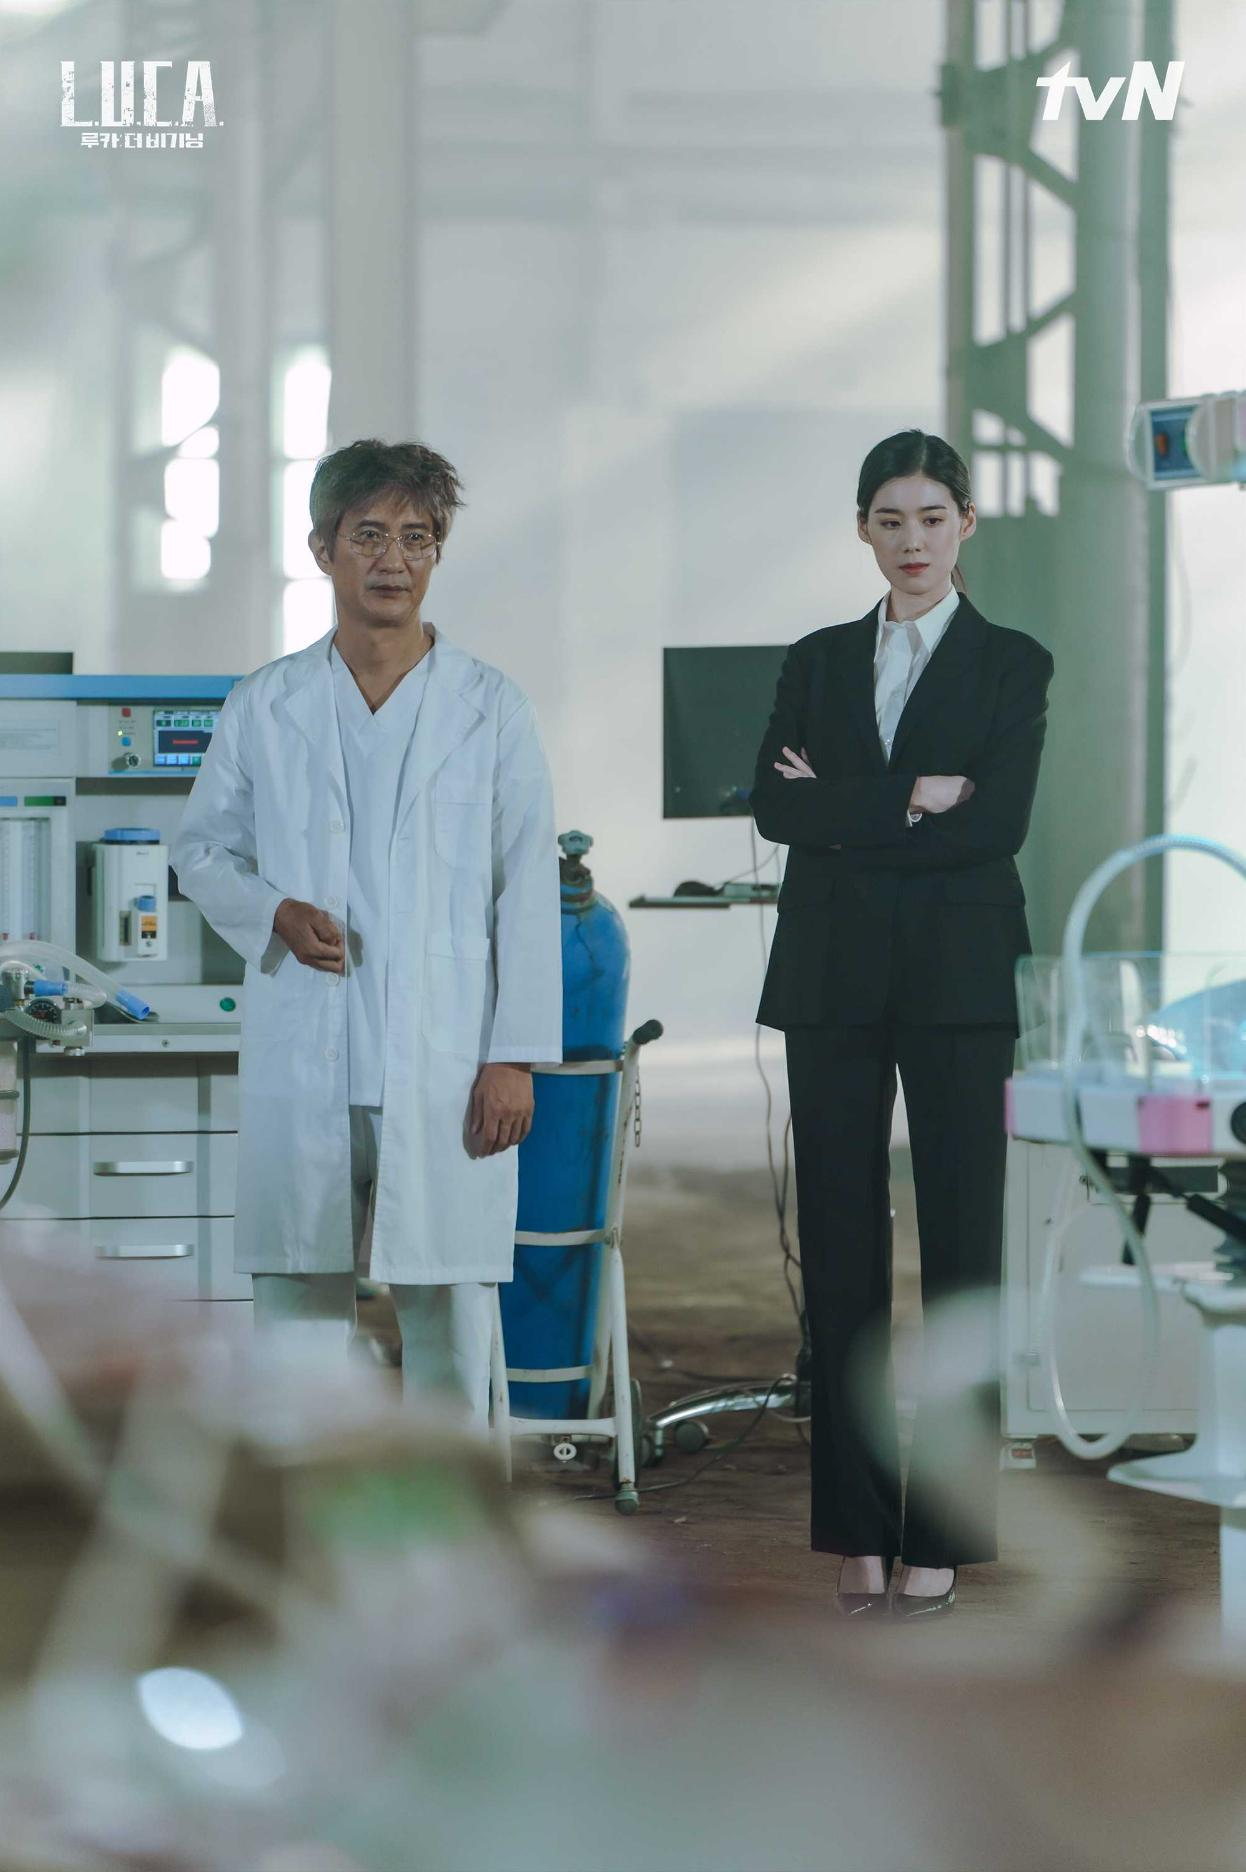 Nae-sang Ahn and Jung Eun-chae in L.U.C.A.: The Beginning (2021)